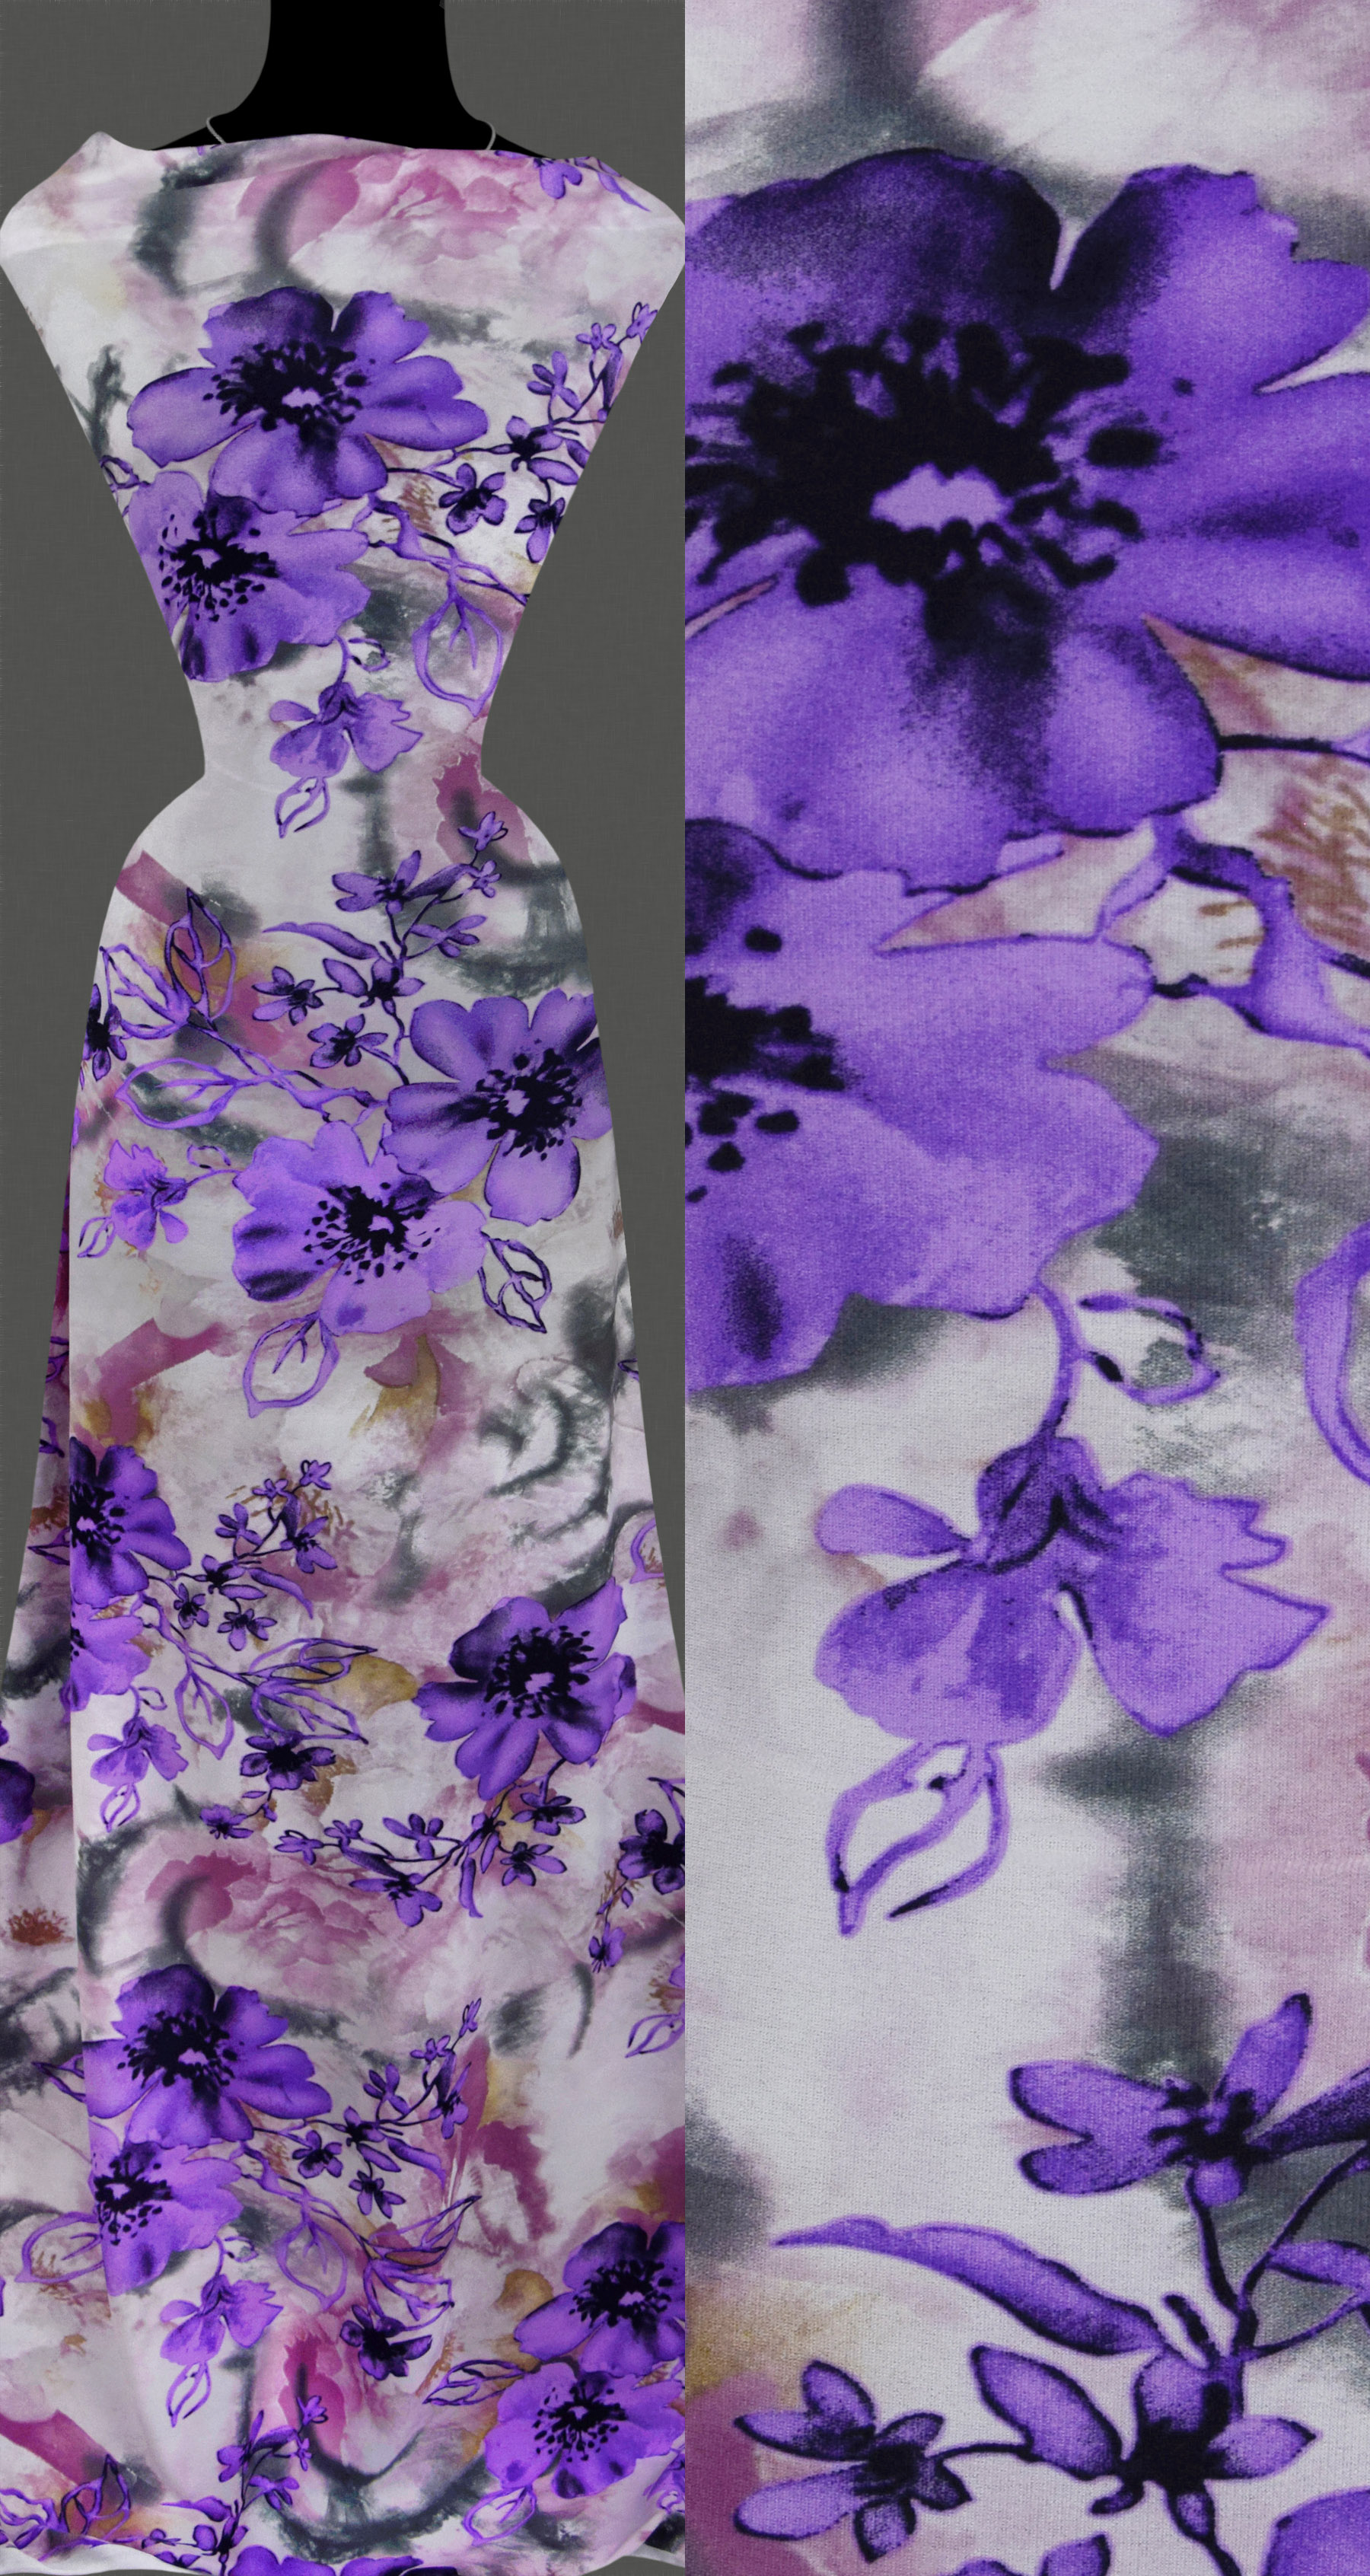 stoff strickstoff elastisch violettfarbene blumen muster blumenmuster ebay. Black Bedroom Furniture Sets. Home Design Ideas